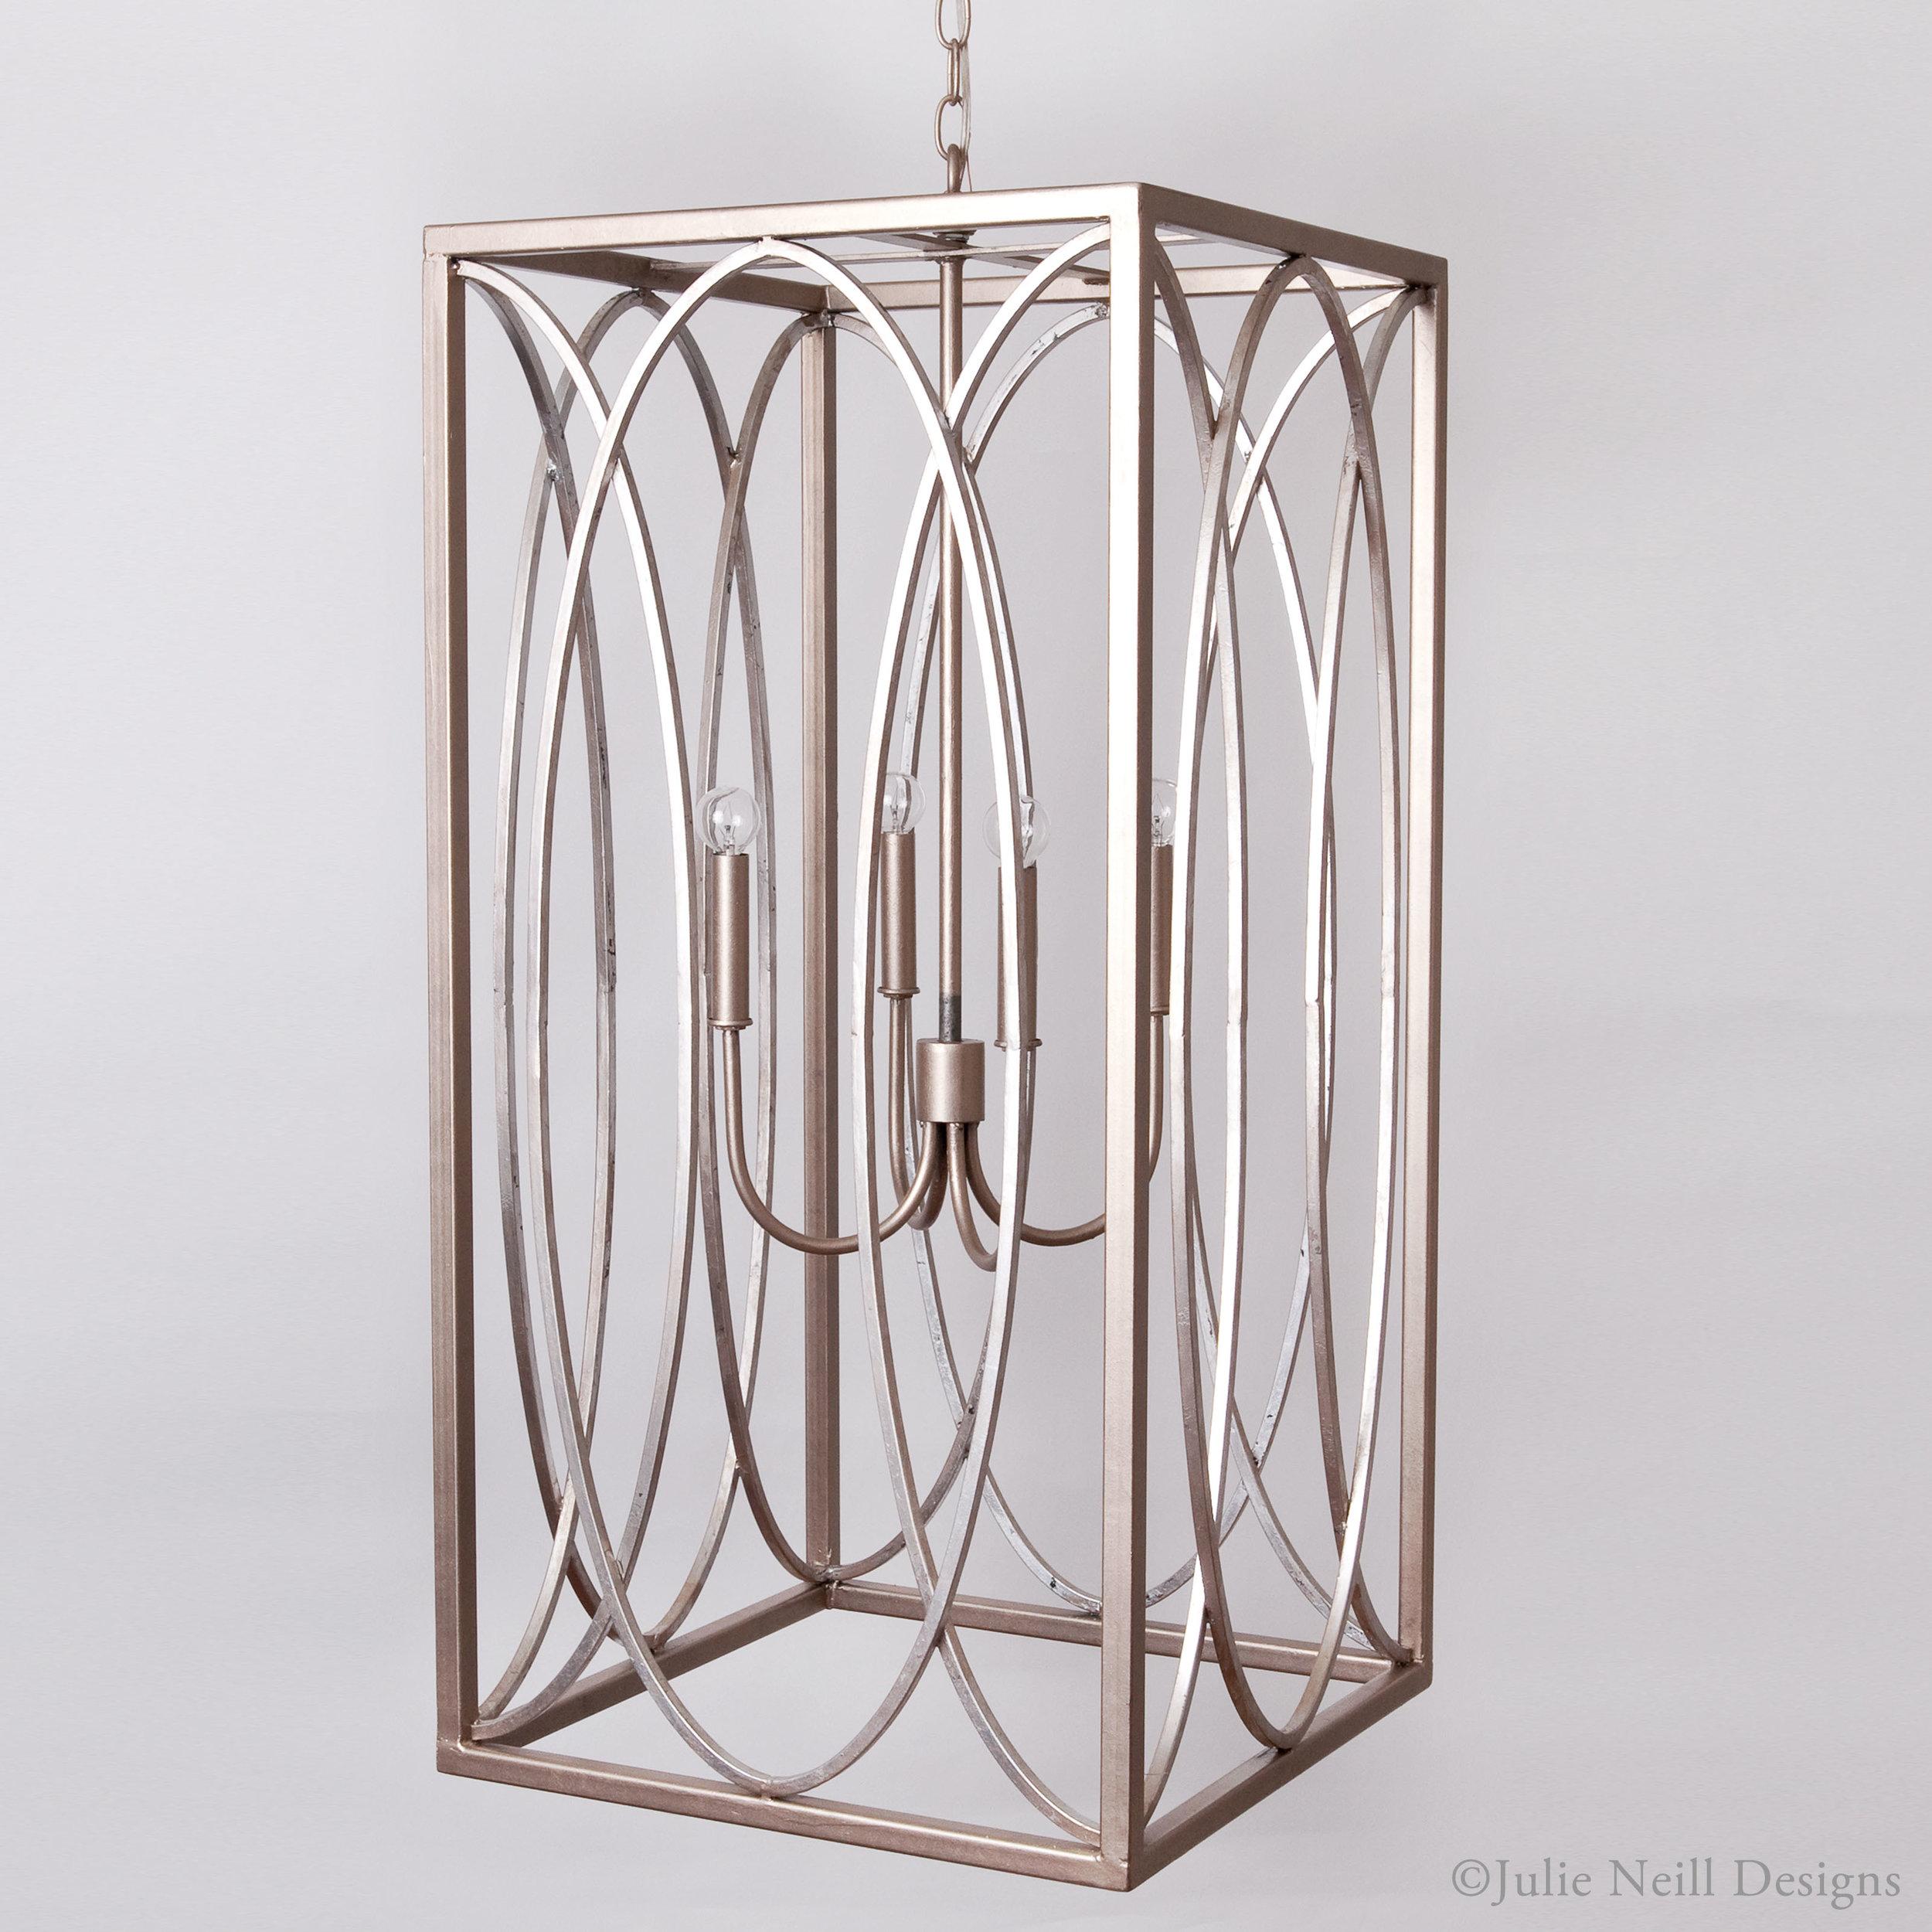 Metropolitan_Lantern_JulieNeillDesigns